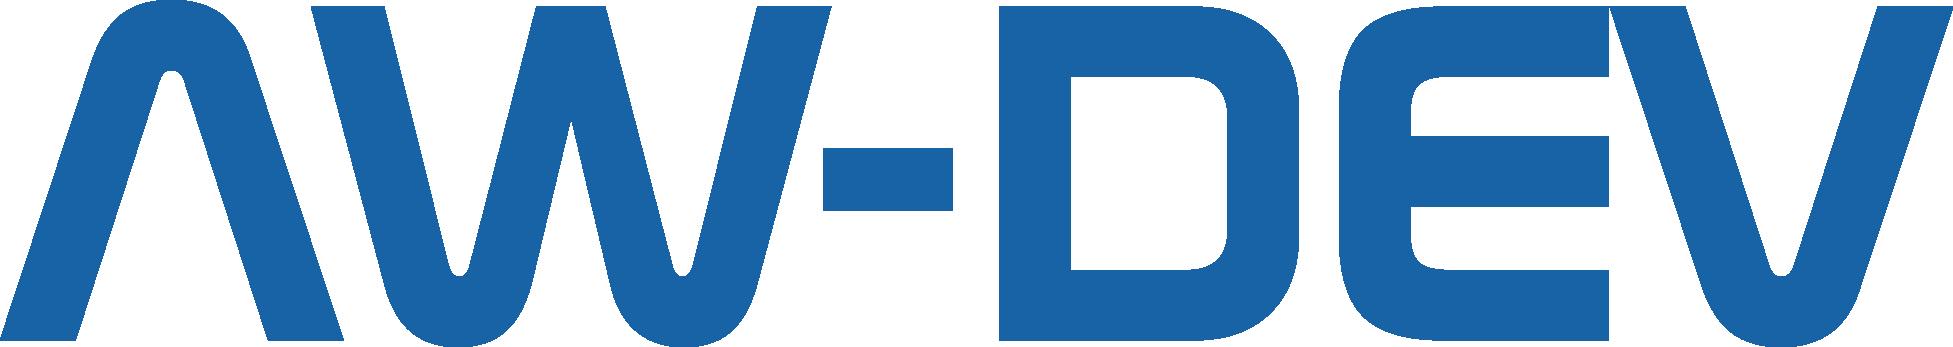 AW-Dev